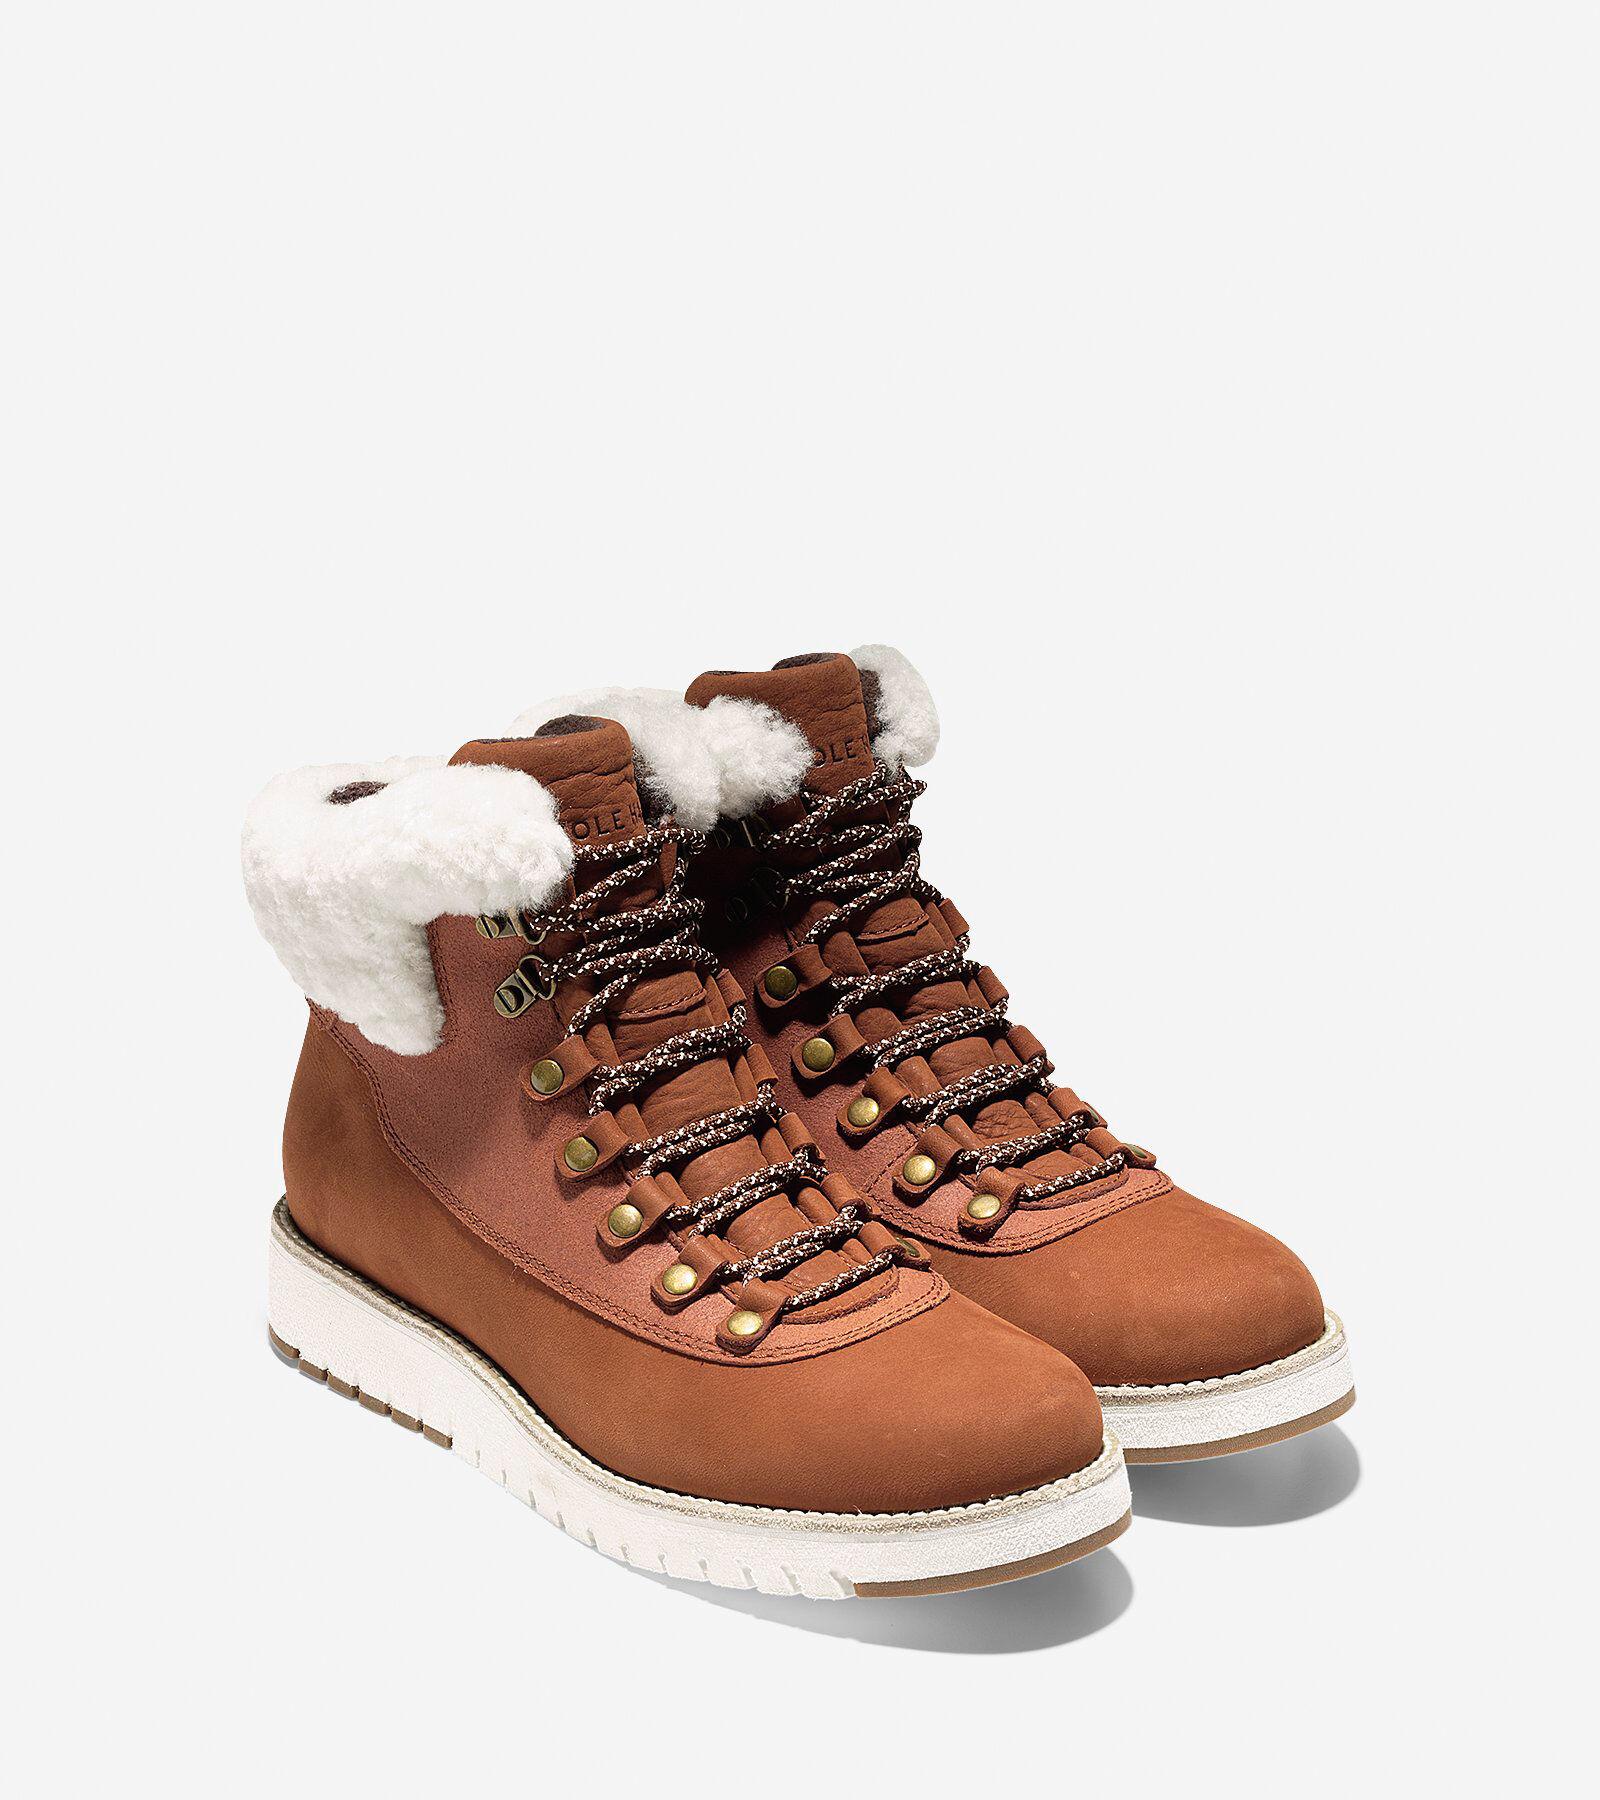 Women's Premium Waterproof Hiker Boots cPKTCjtJ